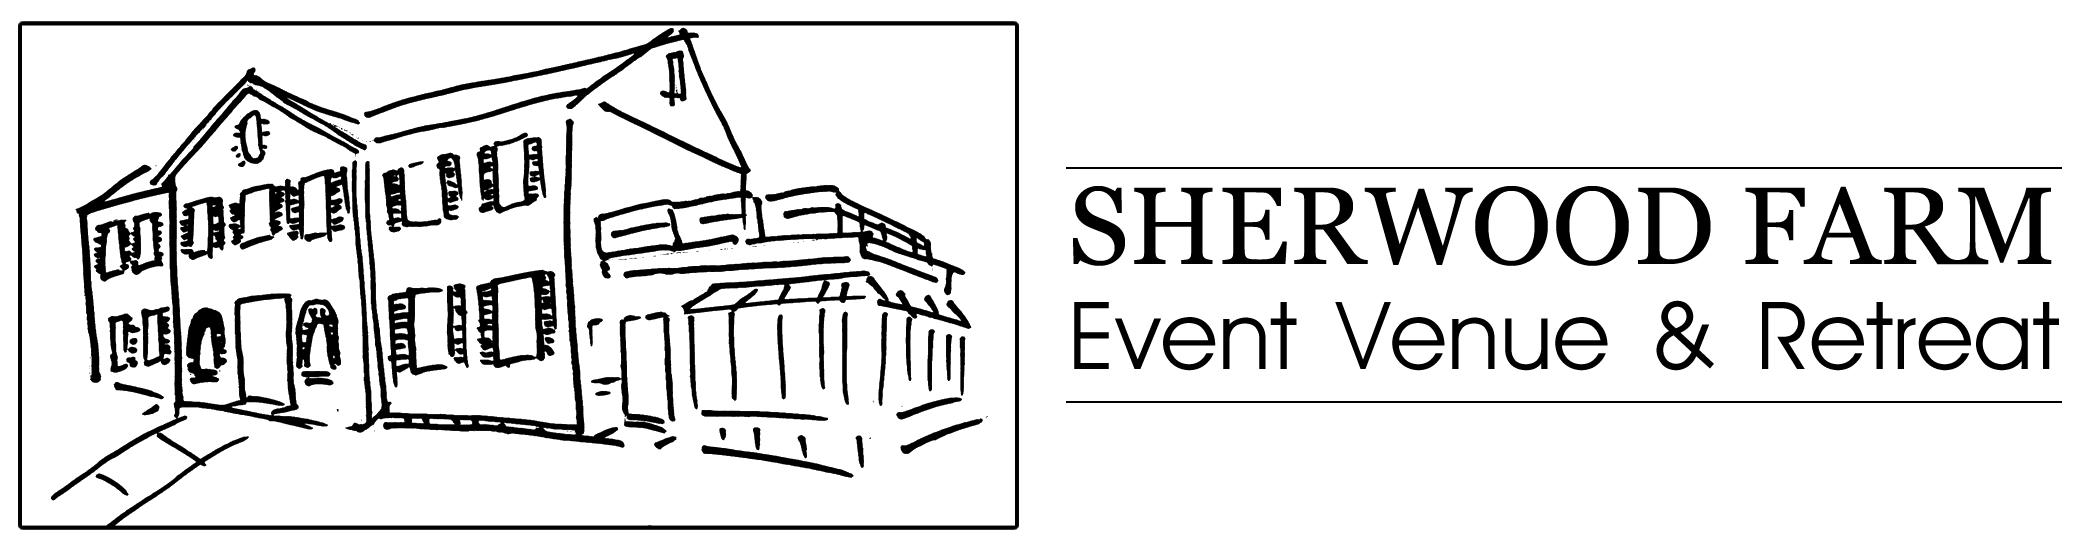 Sherwood Farm Retreat- Event Venue